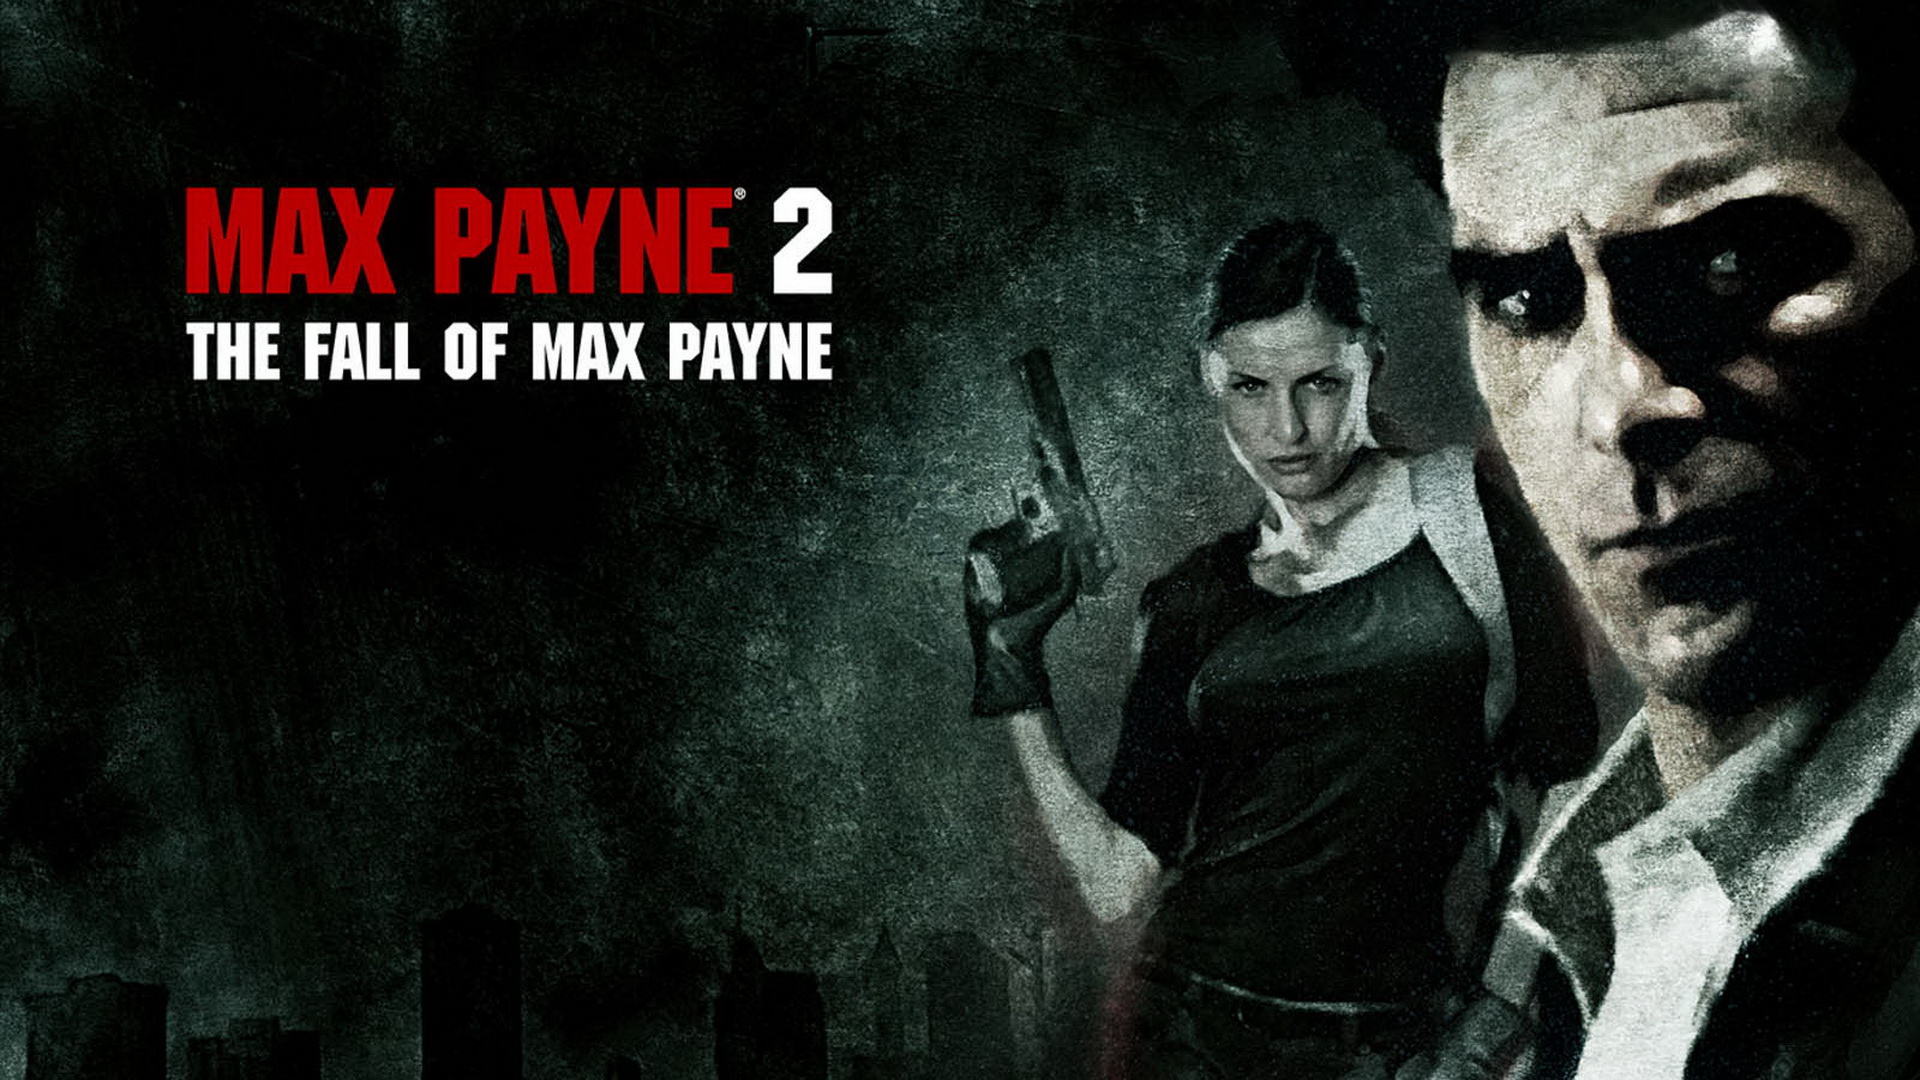 max payne movie summary